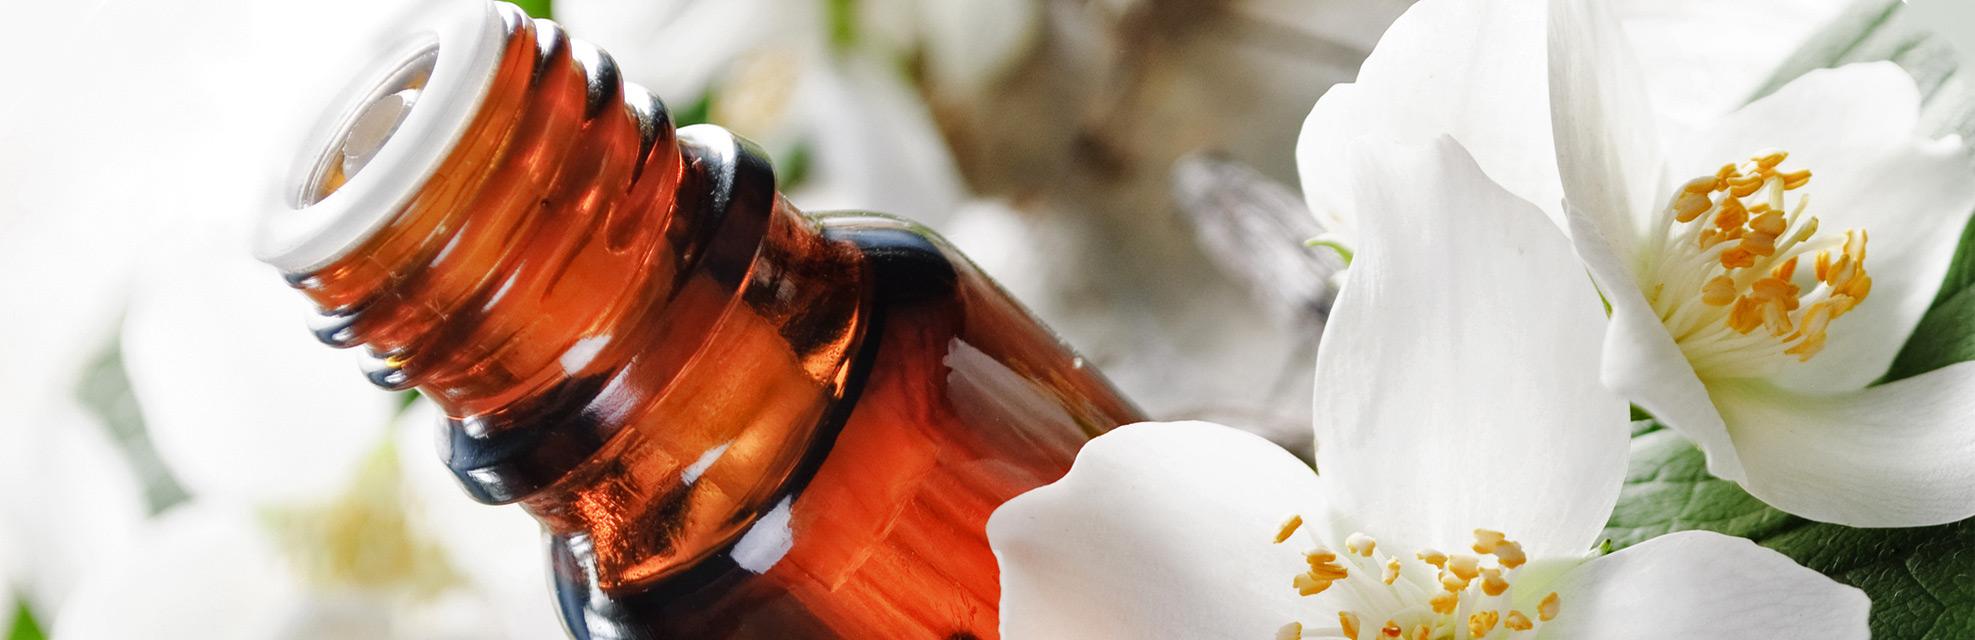 lorann oils essential oils 1/3 ounce size